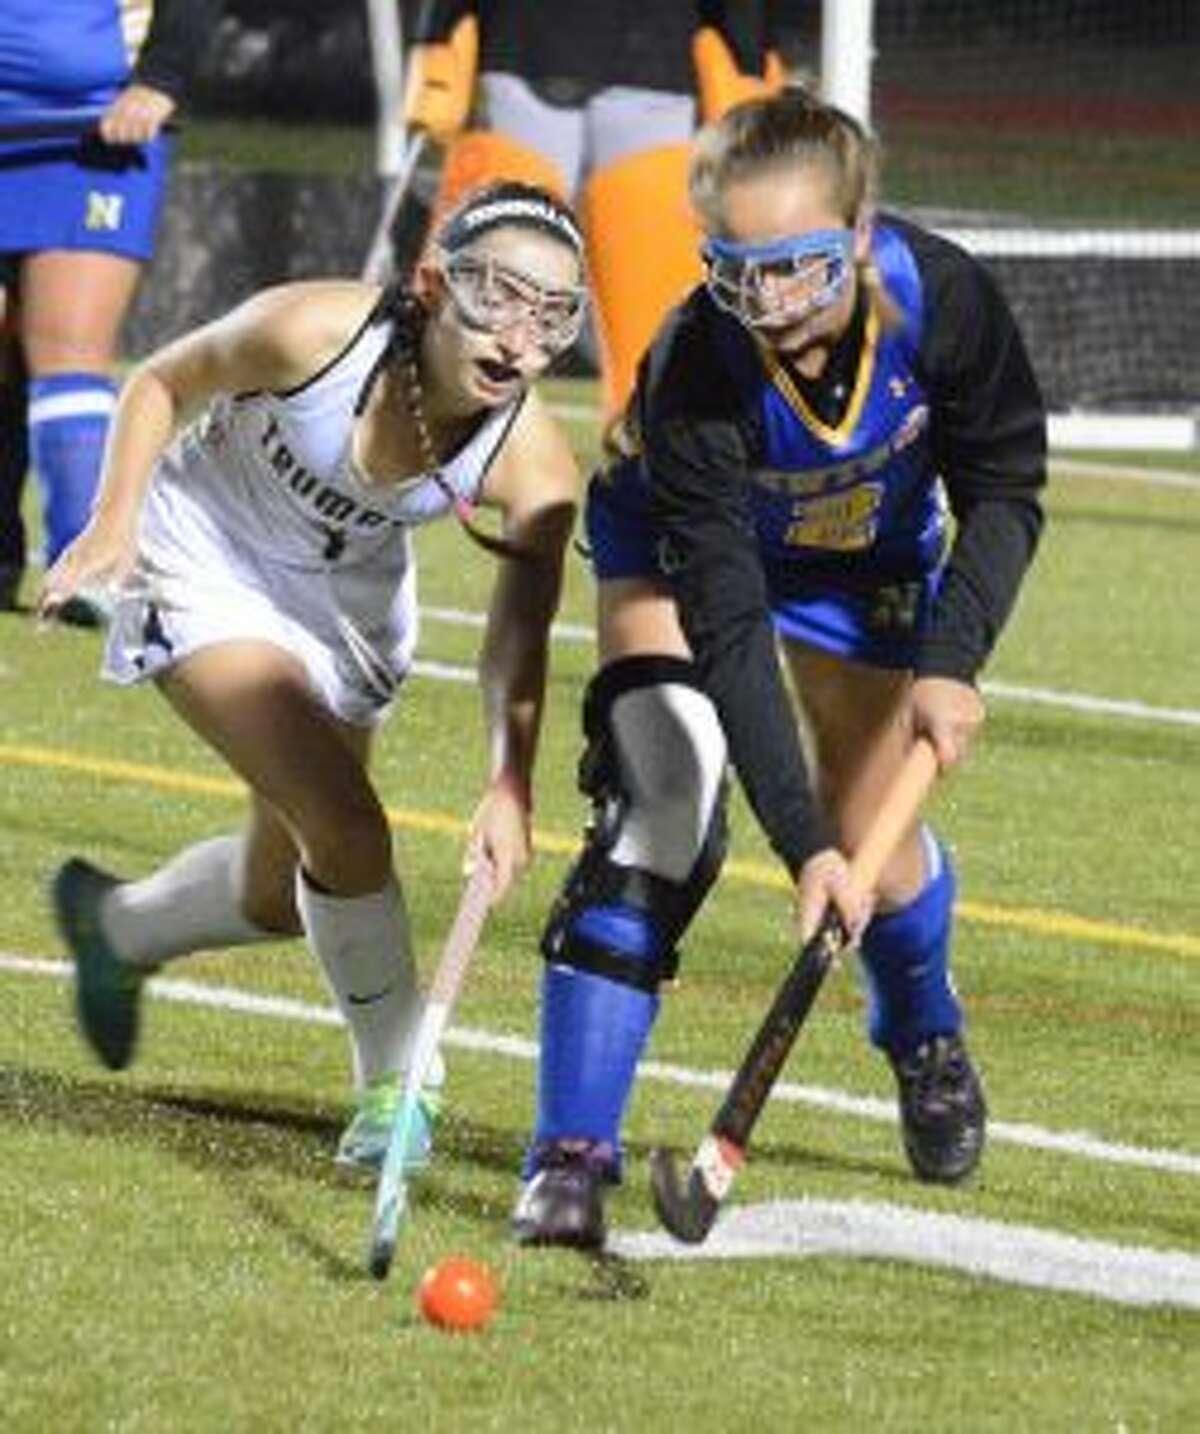 Trumbull's Hayley Adams look to possess ball versus Newtown. - Andy Hutchison photo